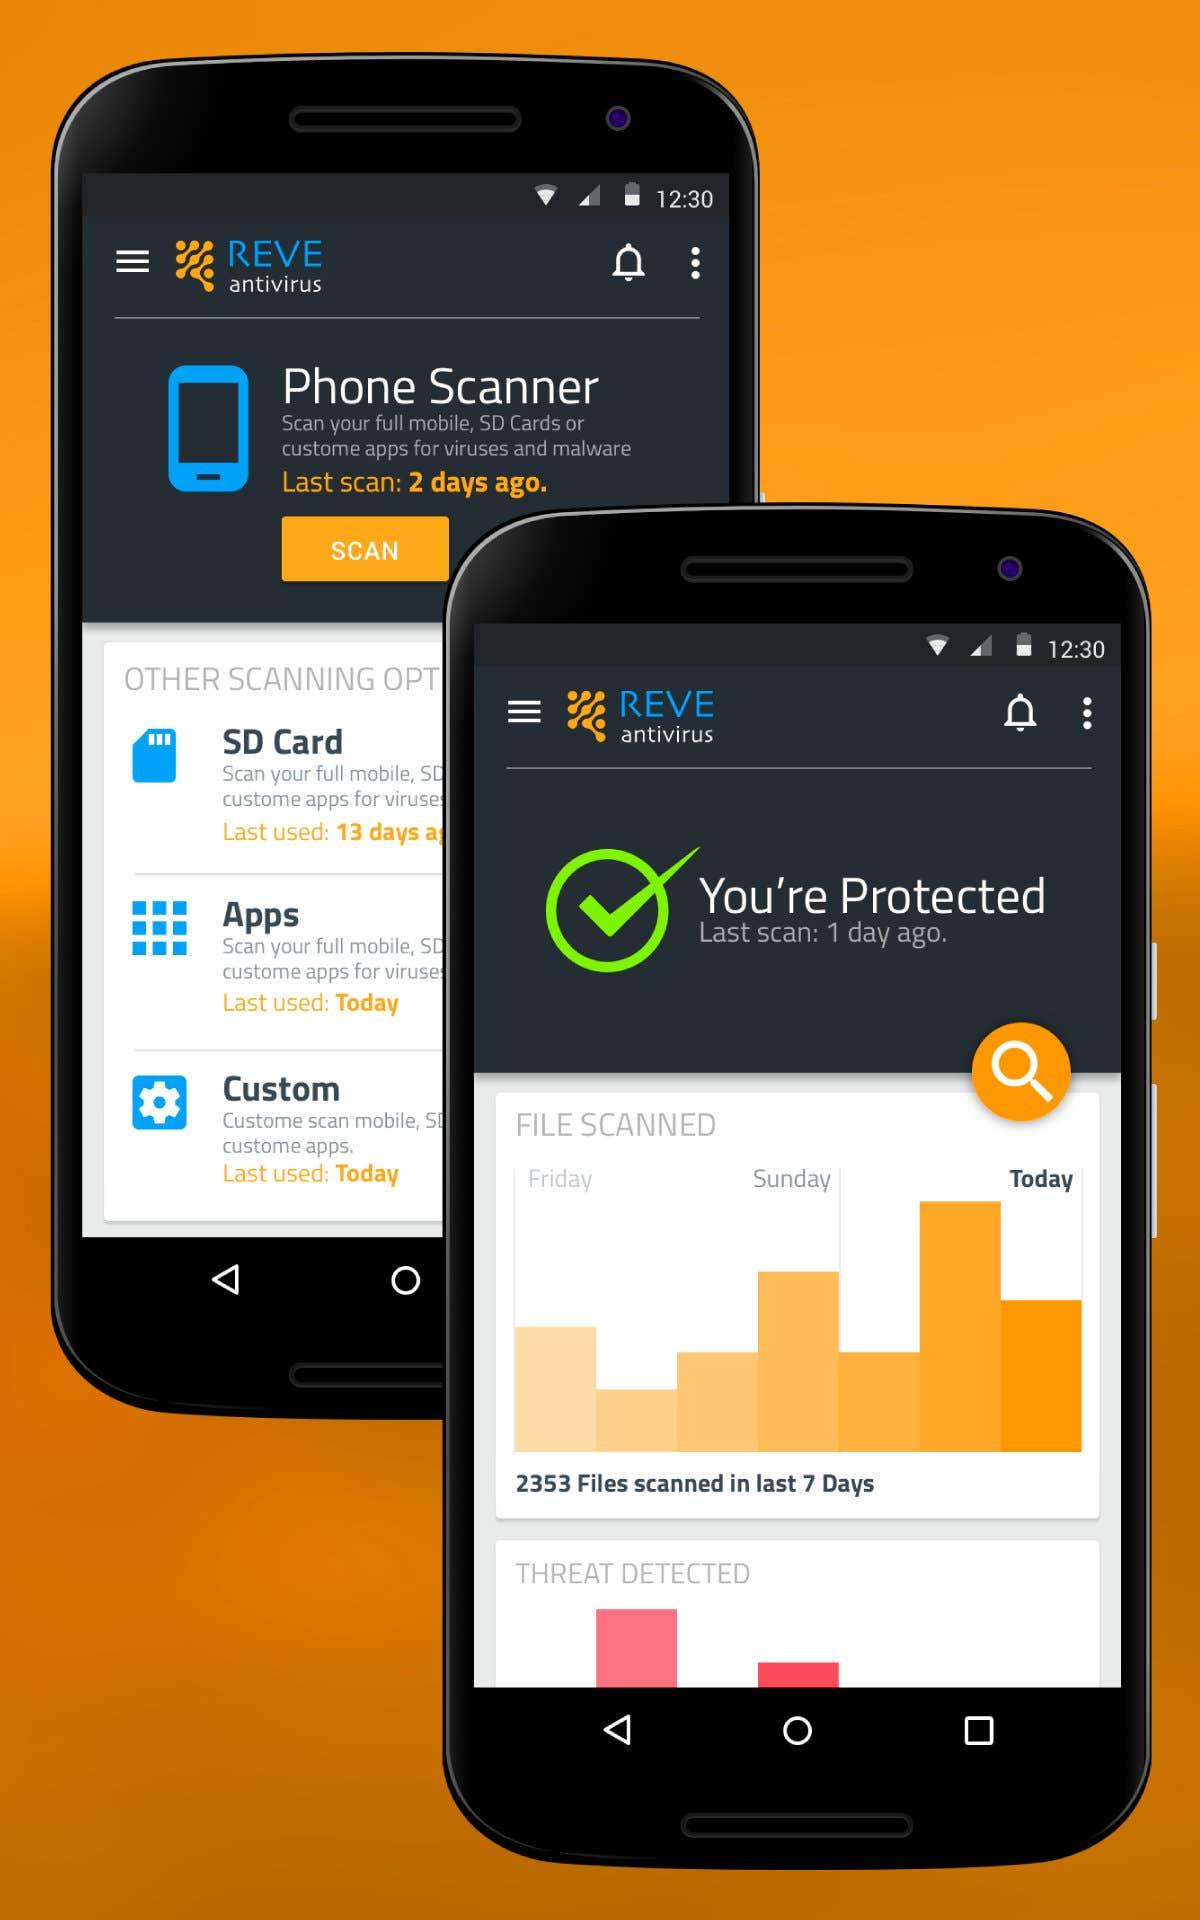 Reve Antivirus for Android